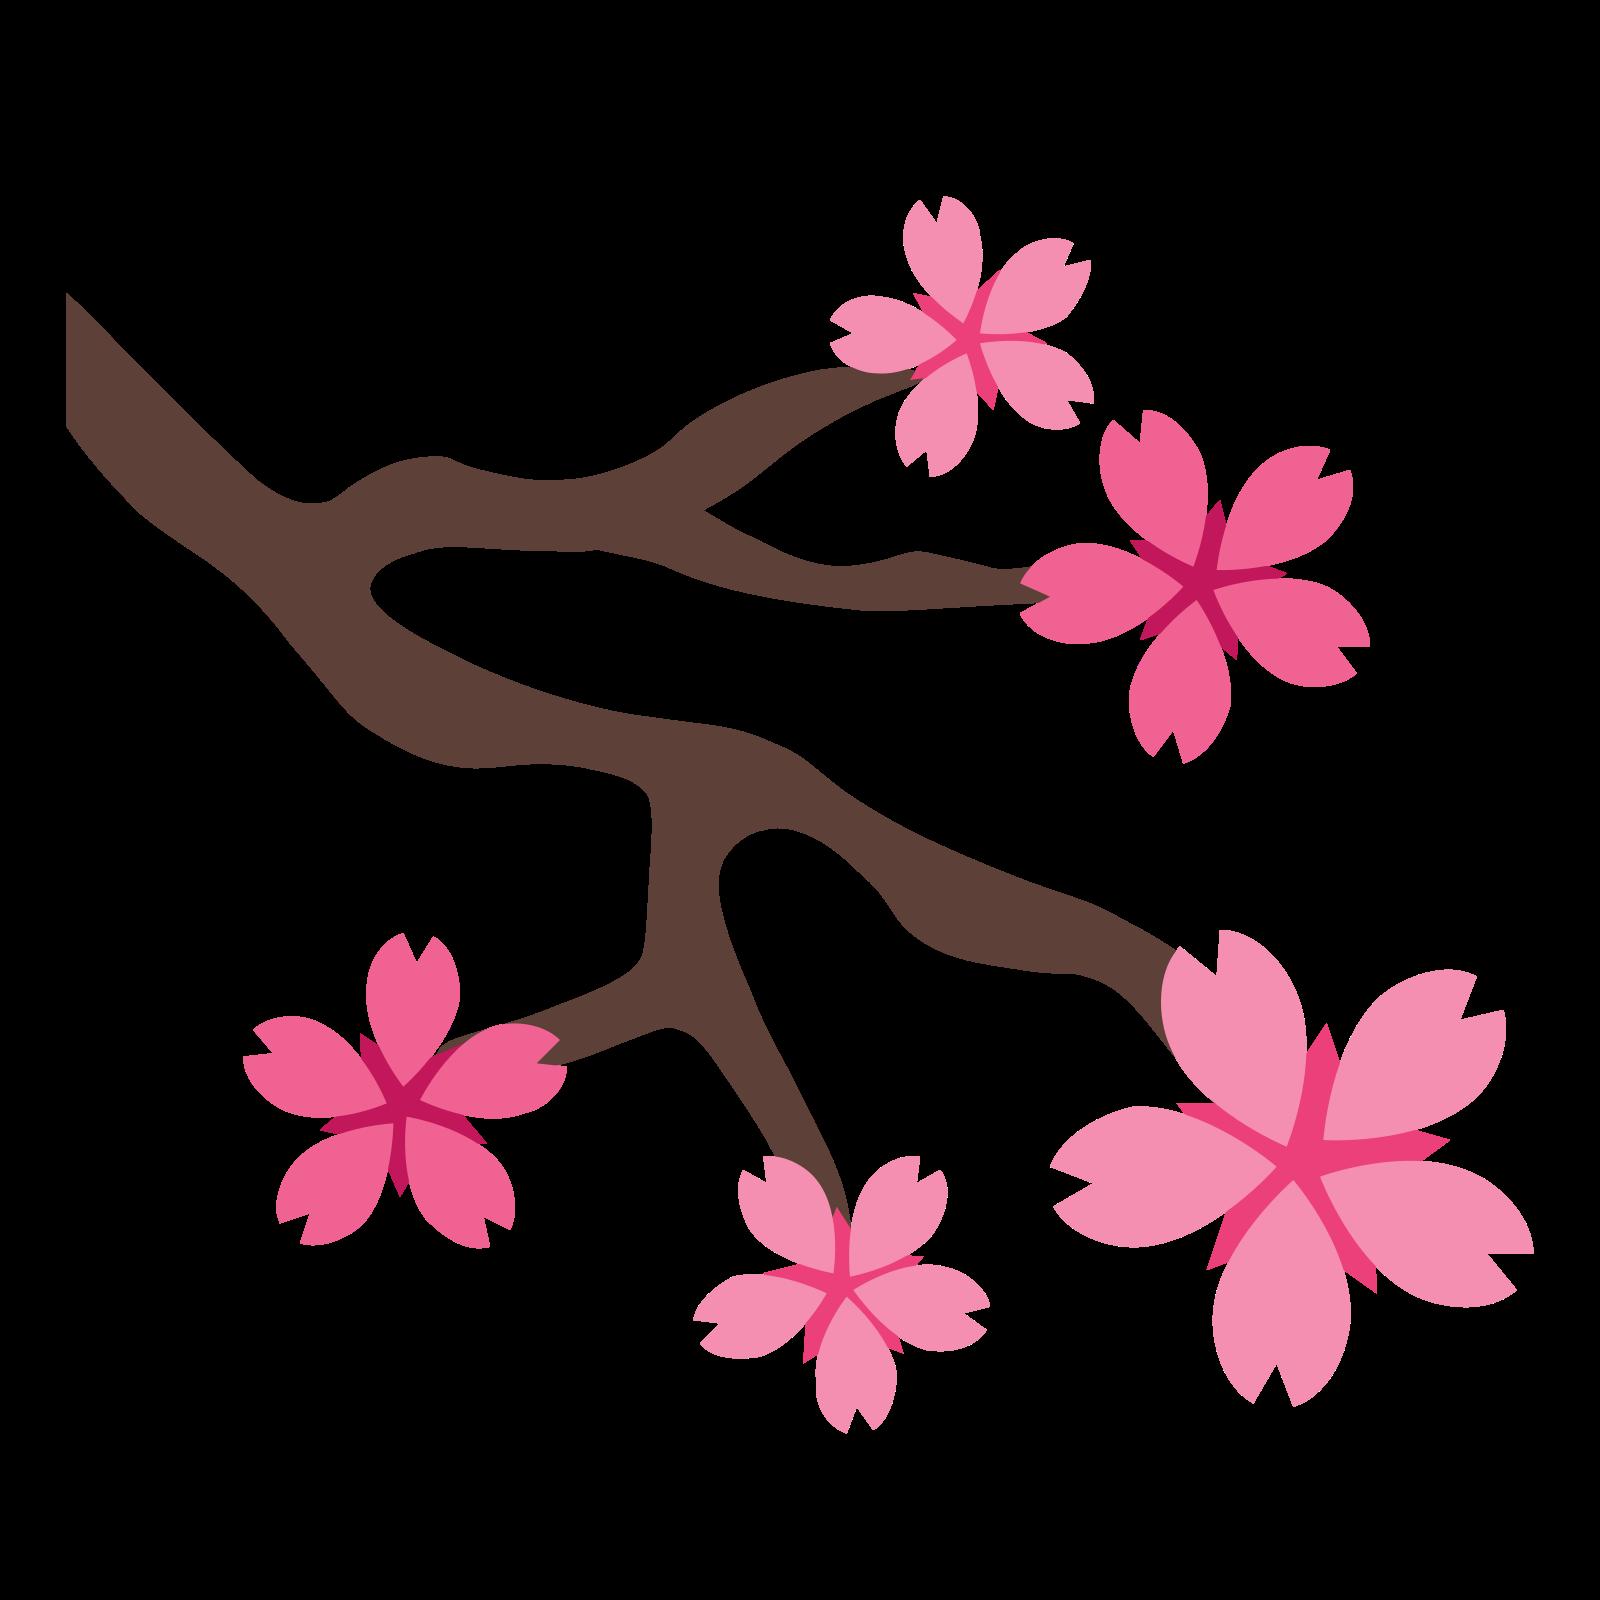 Sakura flower png. Ic ne t l